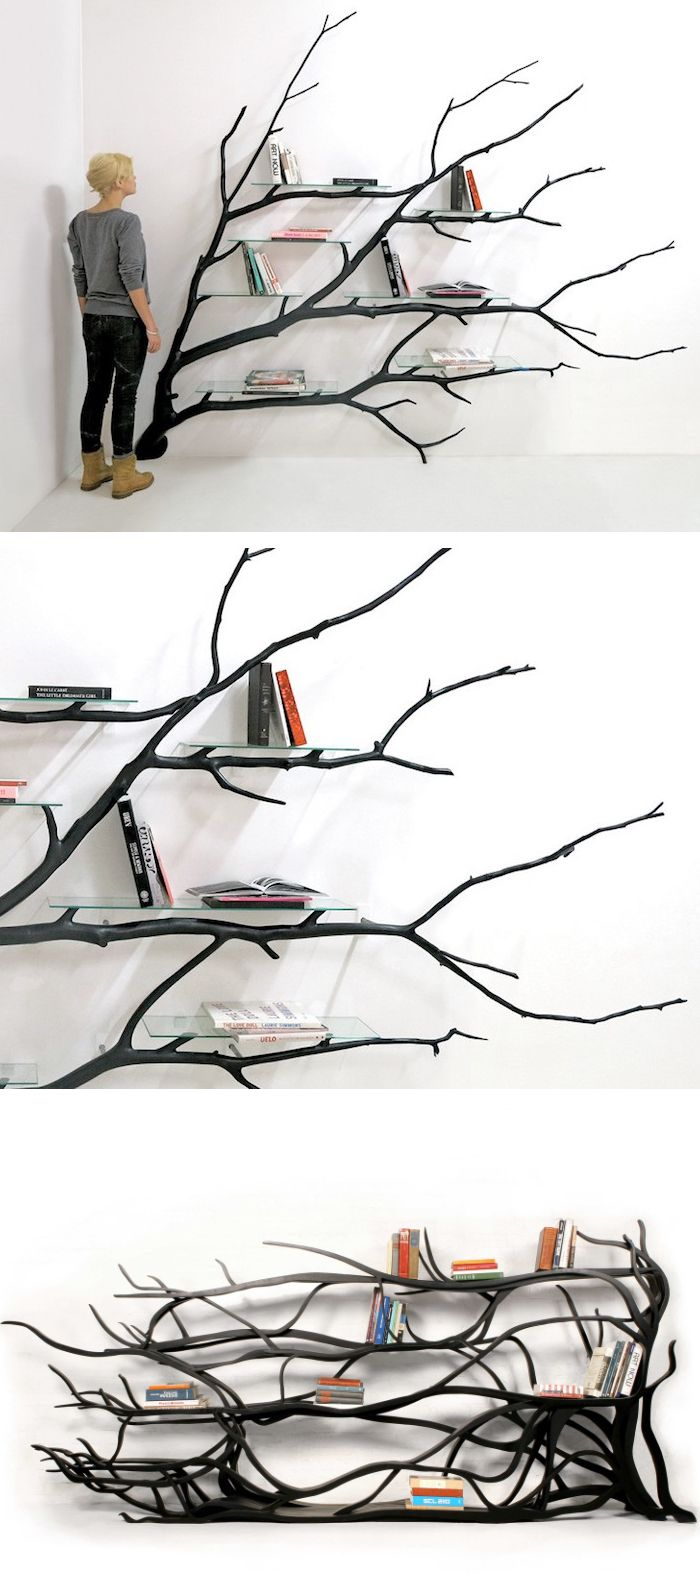 Wooden shelves tree tree branch bookshelf diy tree shaped shelf - Found Fallen Tree Branch Is Repurposed Into Beautifully Unconventional Shelving